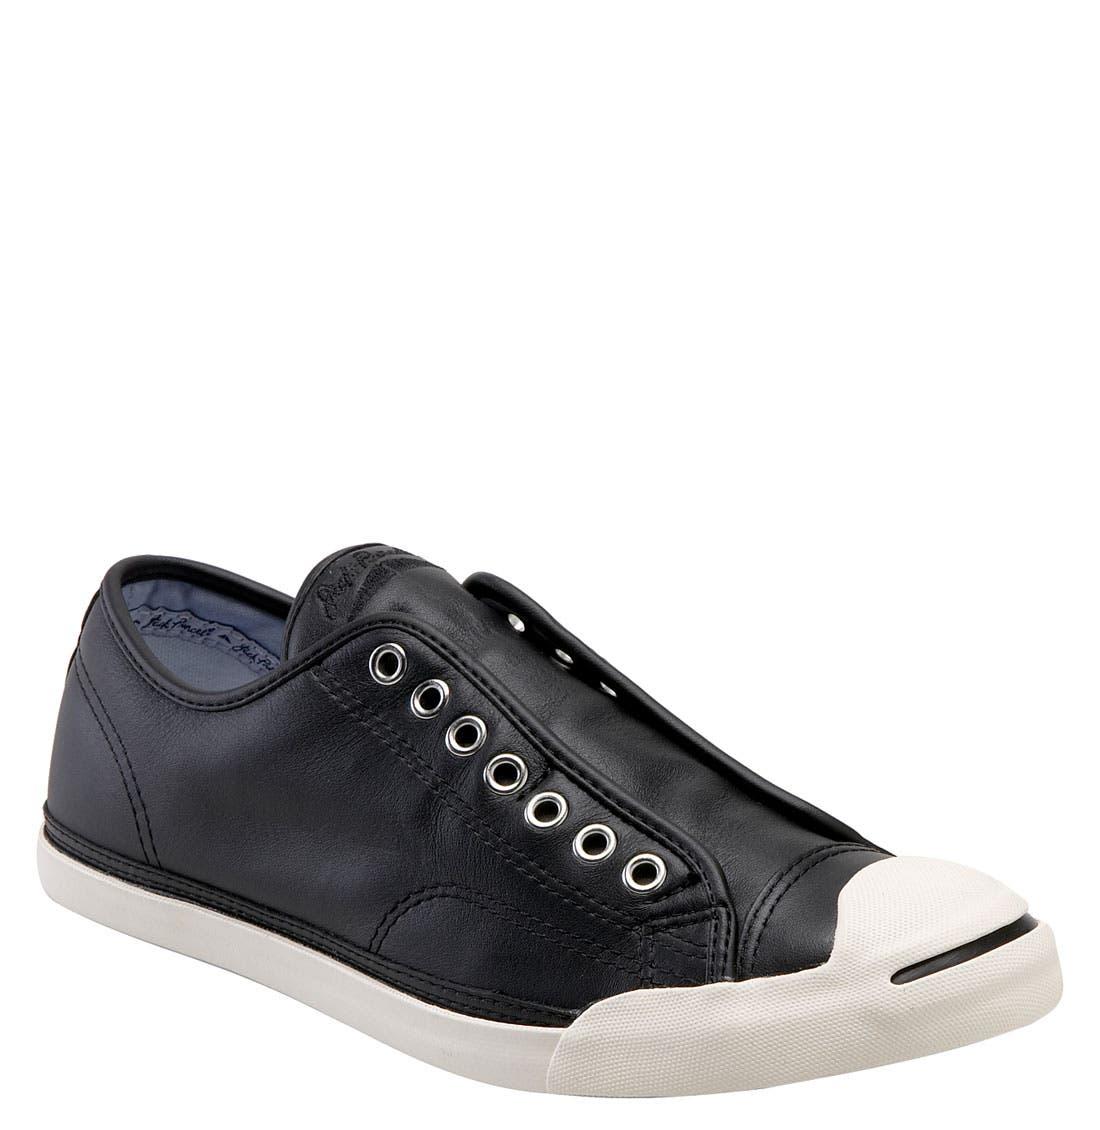 Alternate Image 1 Selected - Converse 'Jack Purcell LP' Slip-On Sneaker